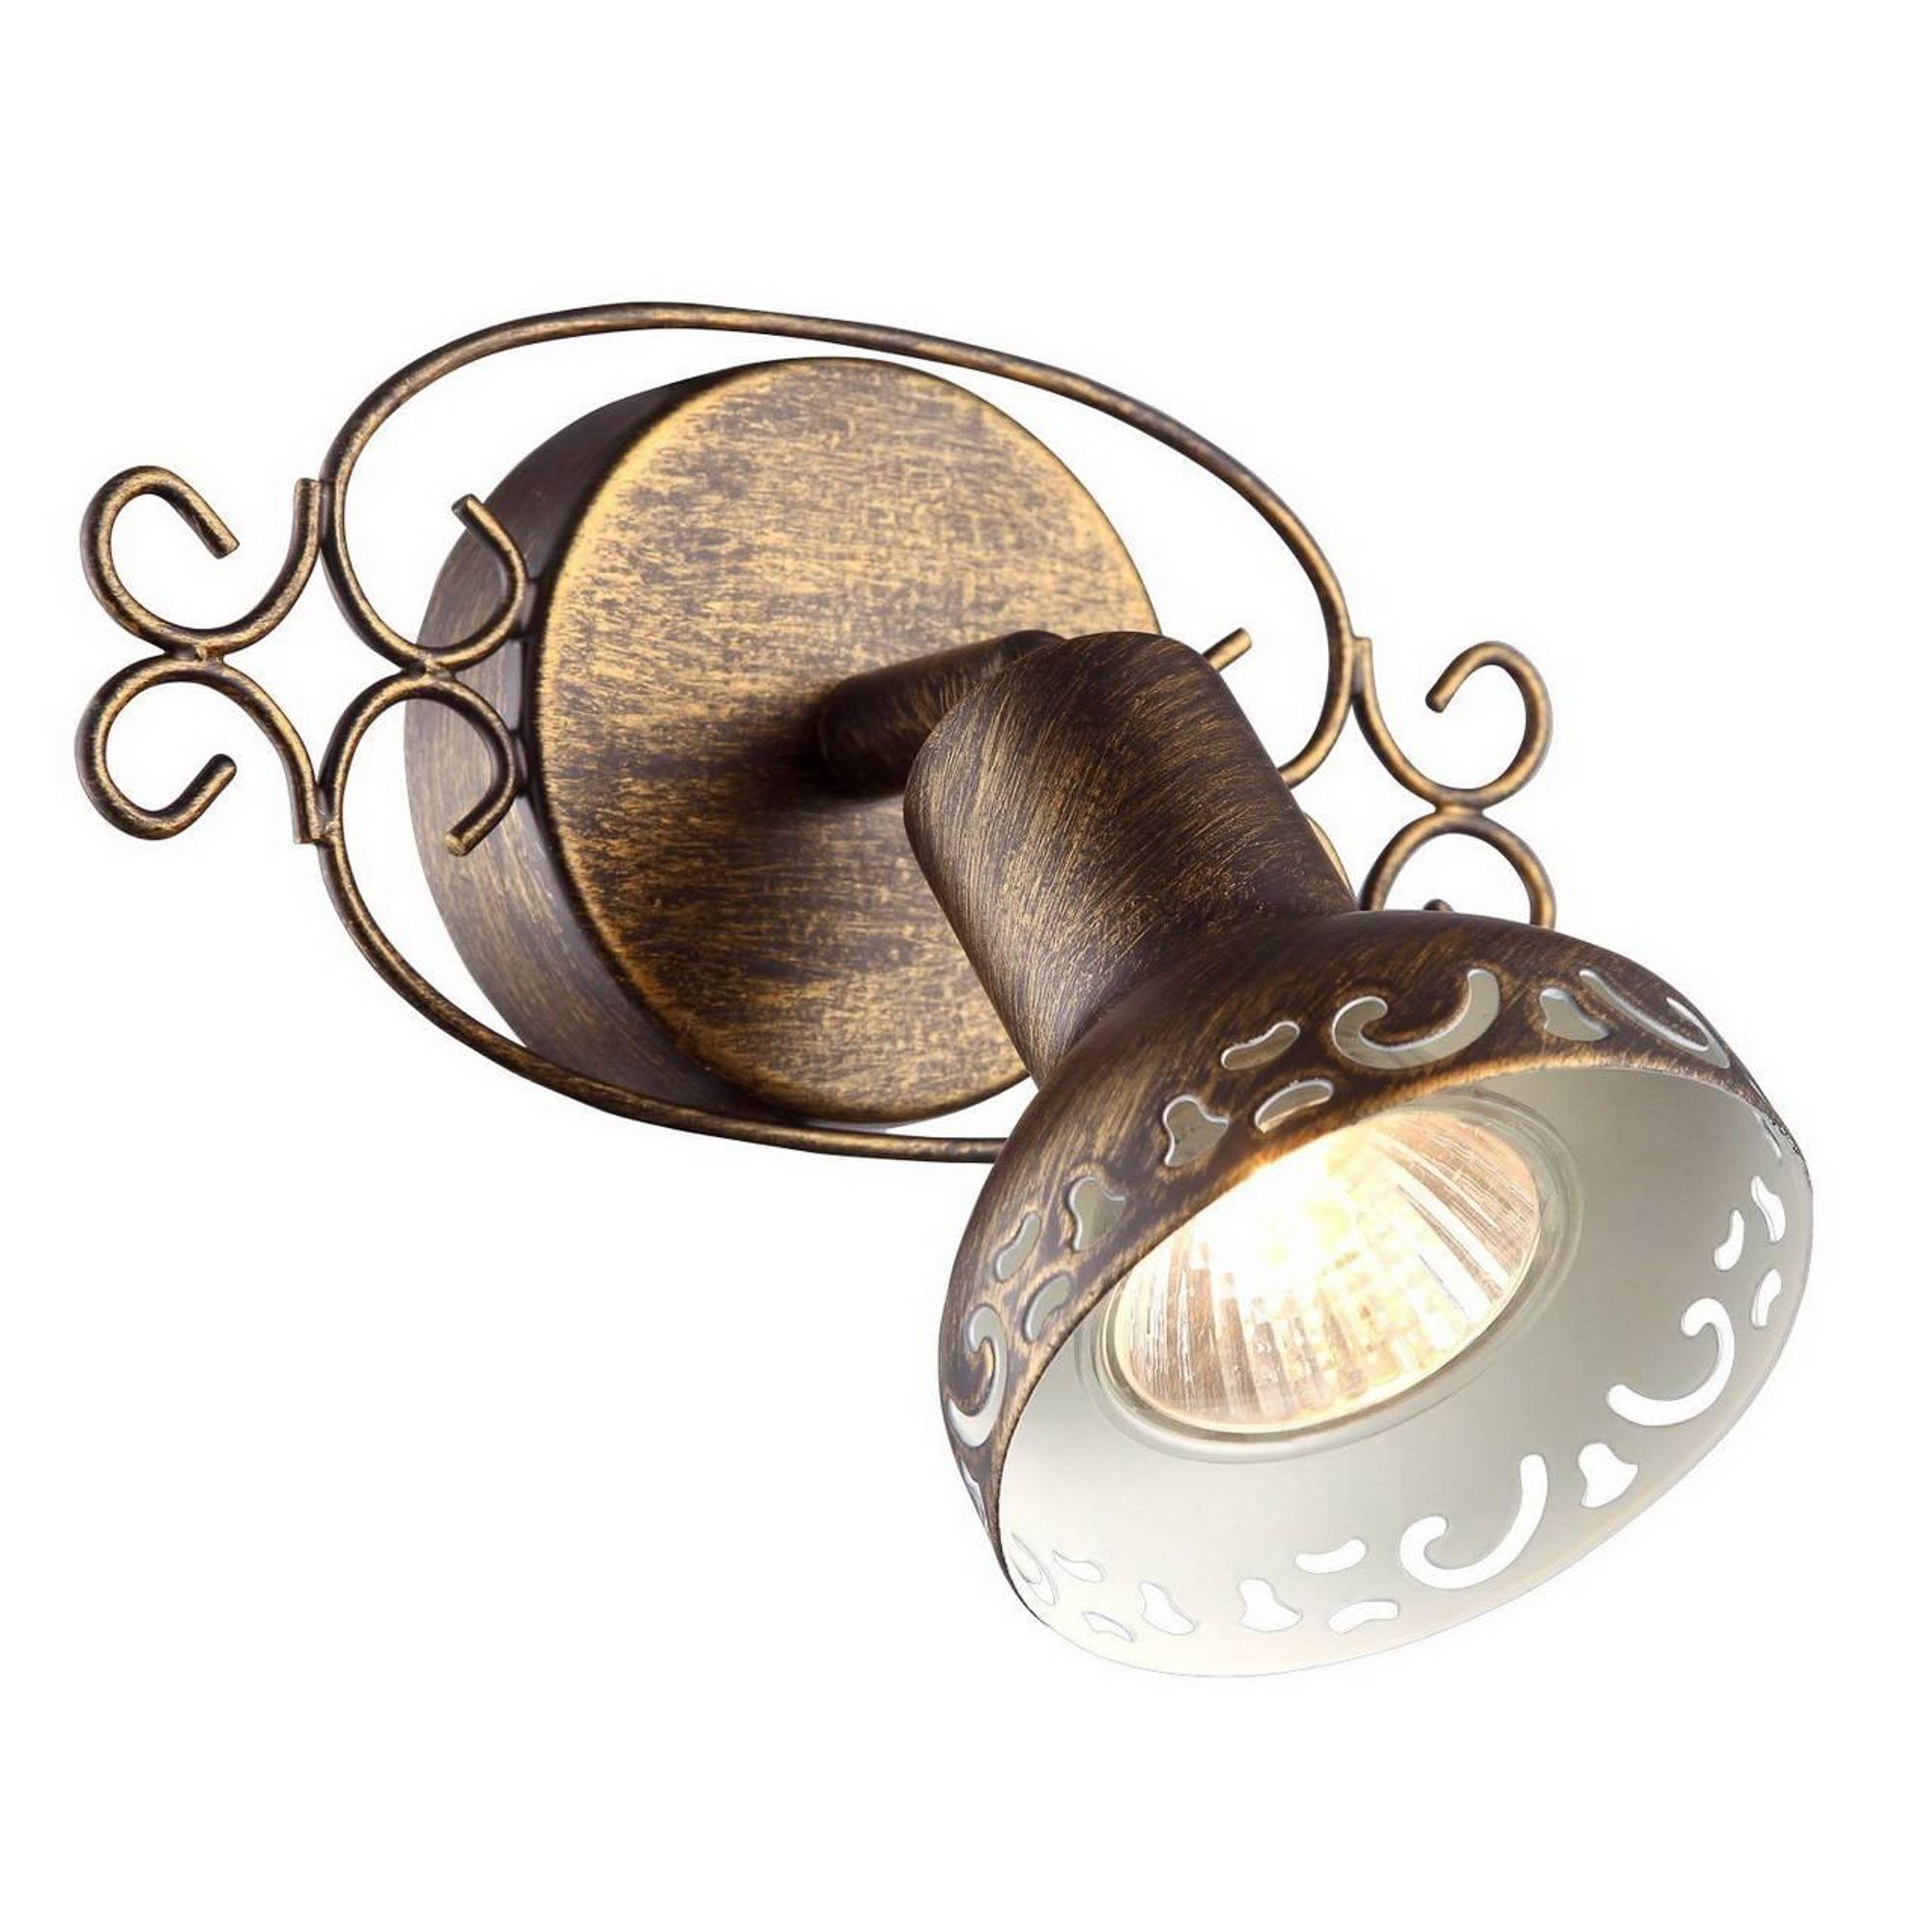 Спот Arte Lamp Focus A5219AP-1BR arte бра arte cone a9330ap 1br i xy063n